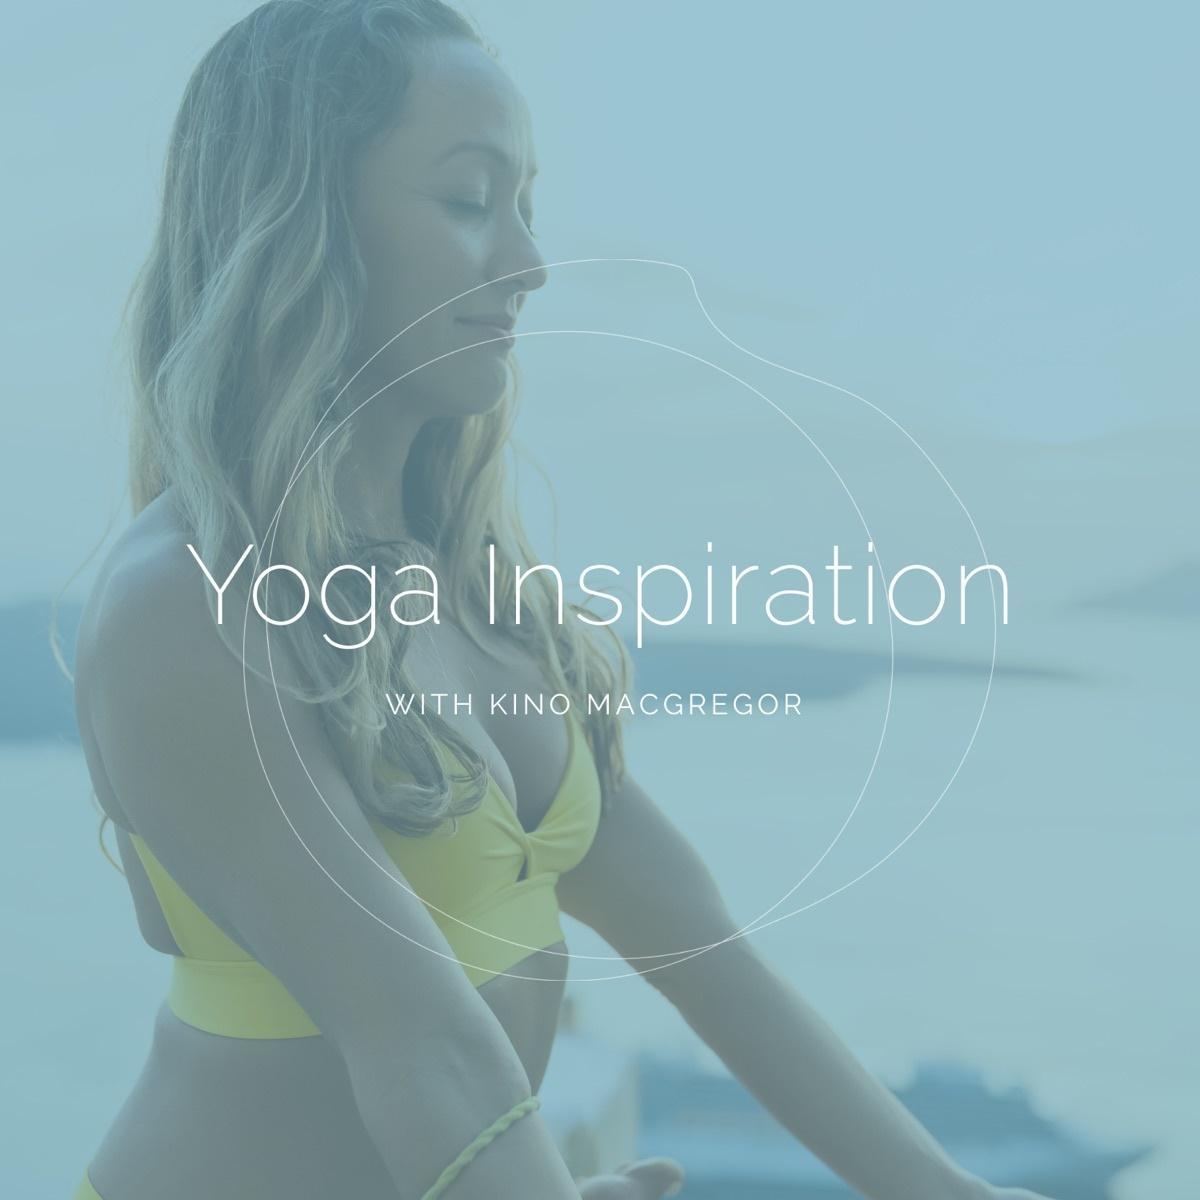 Kino podcast yoga inspiration